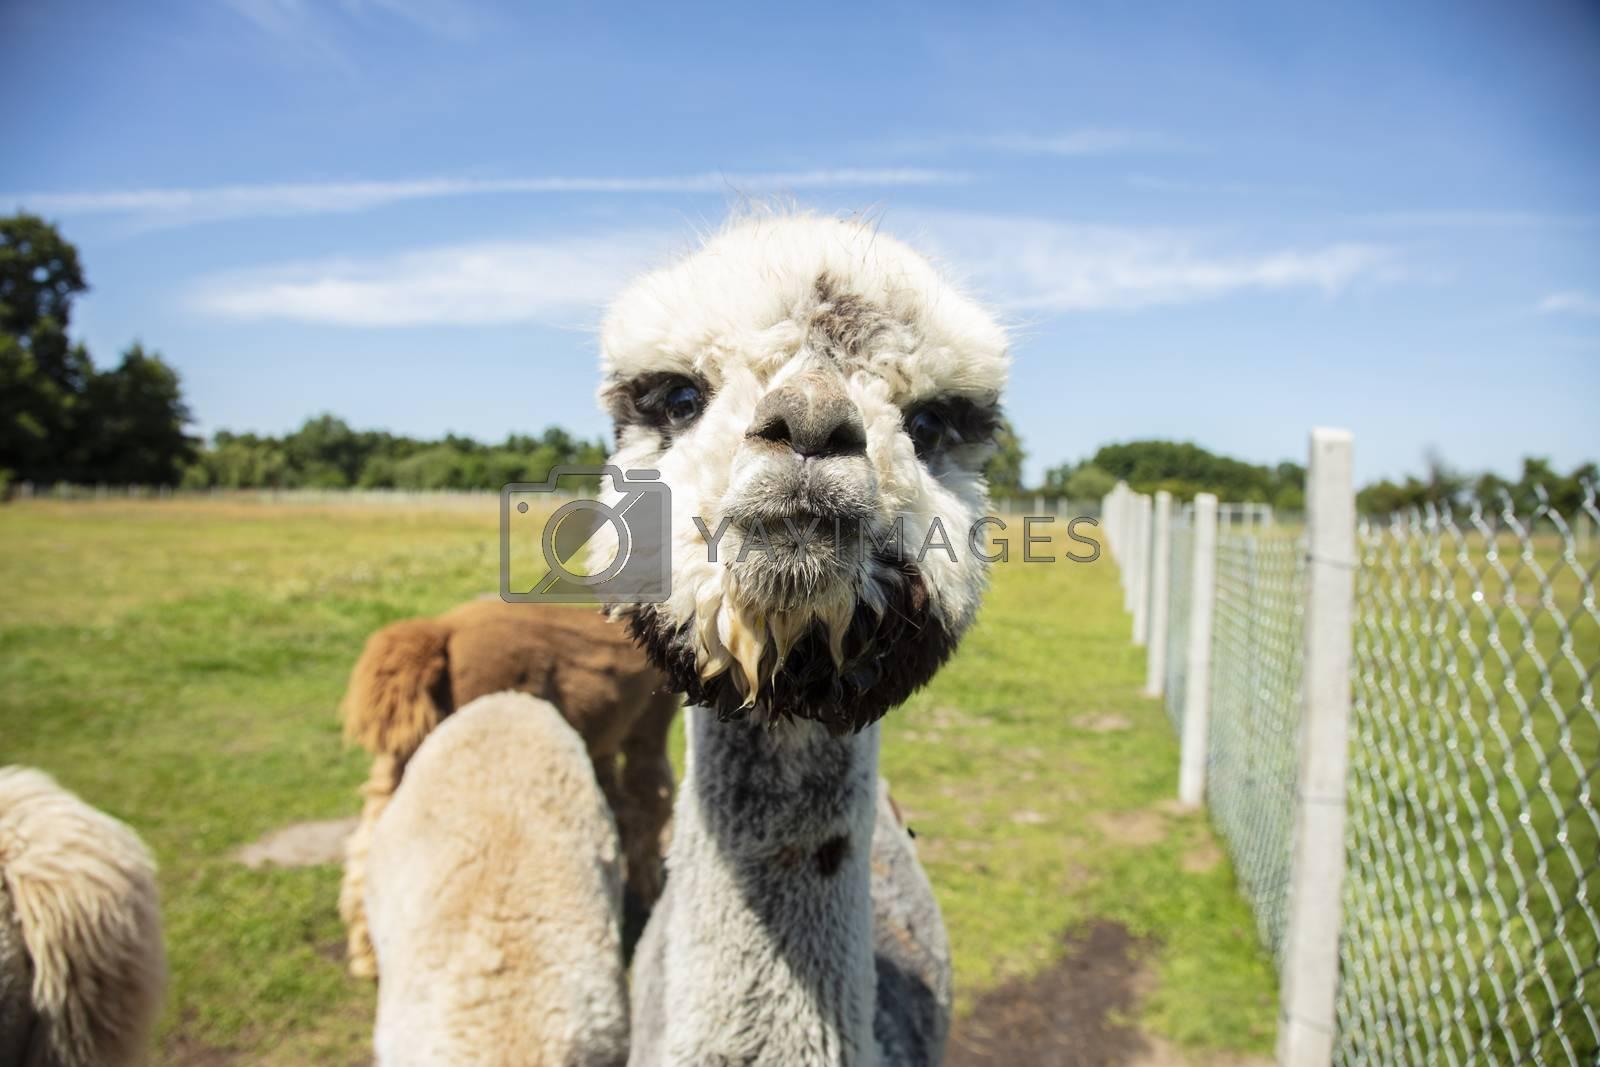 Beautiful South American alpacas in a free range